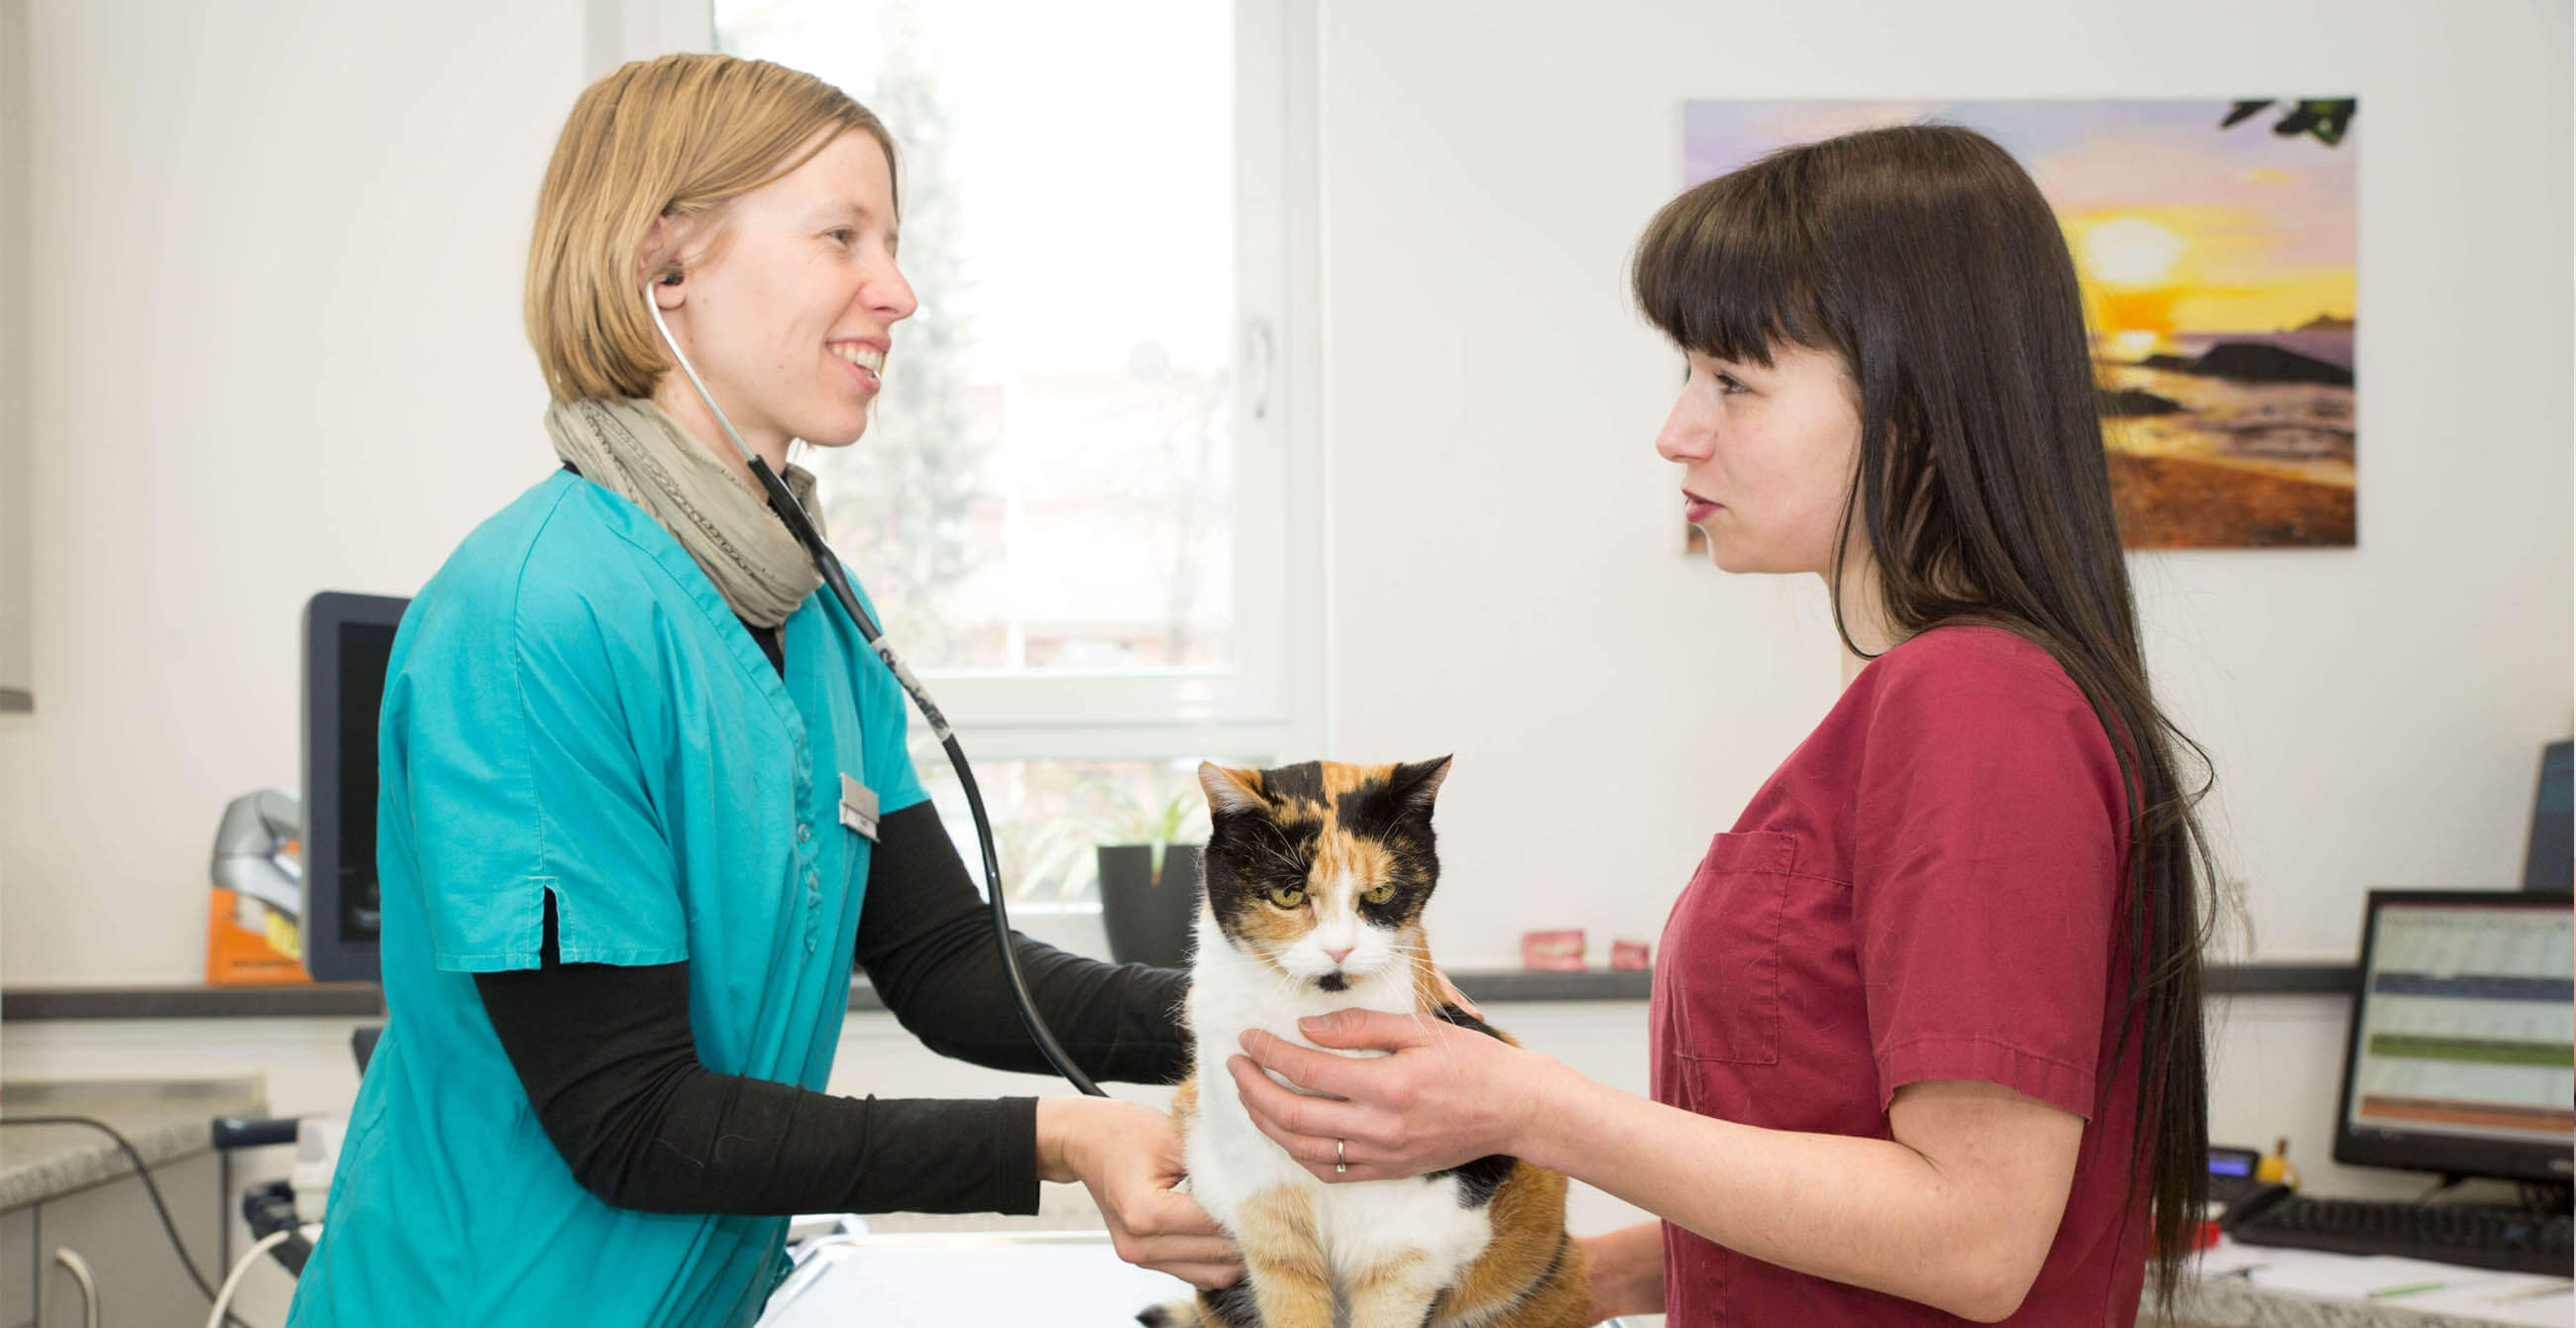 Tierarzt Untersuchung